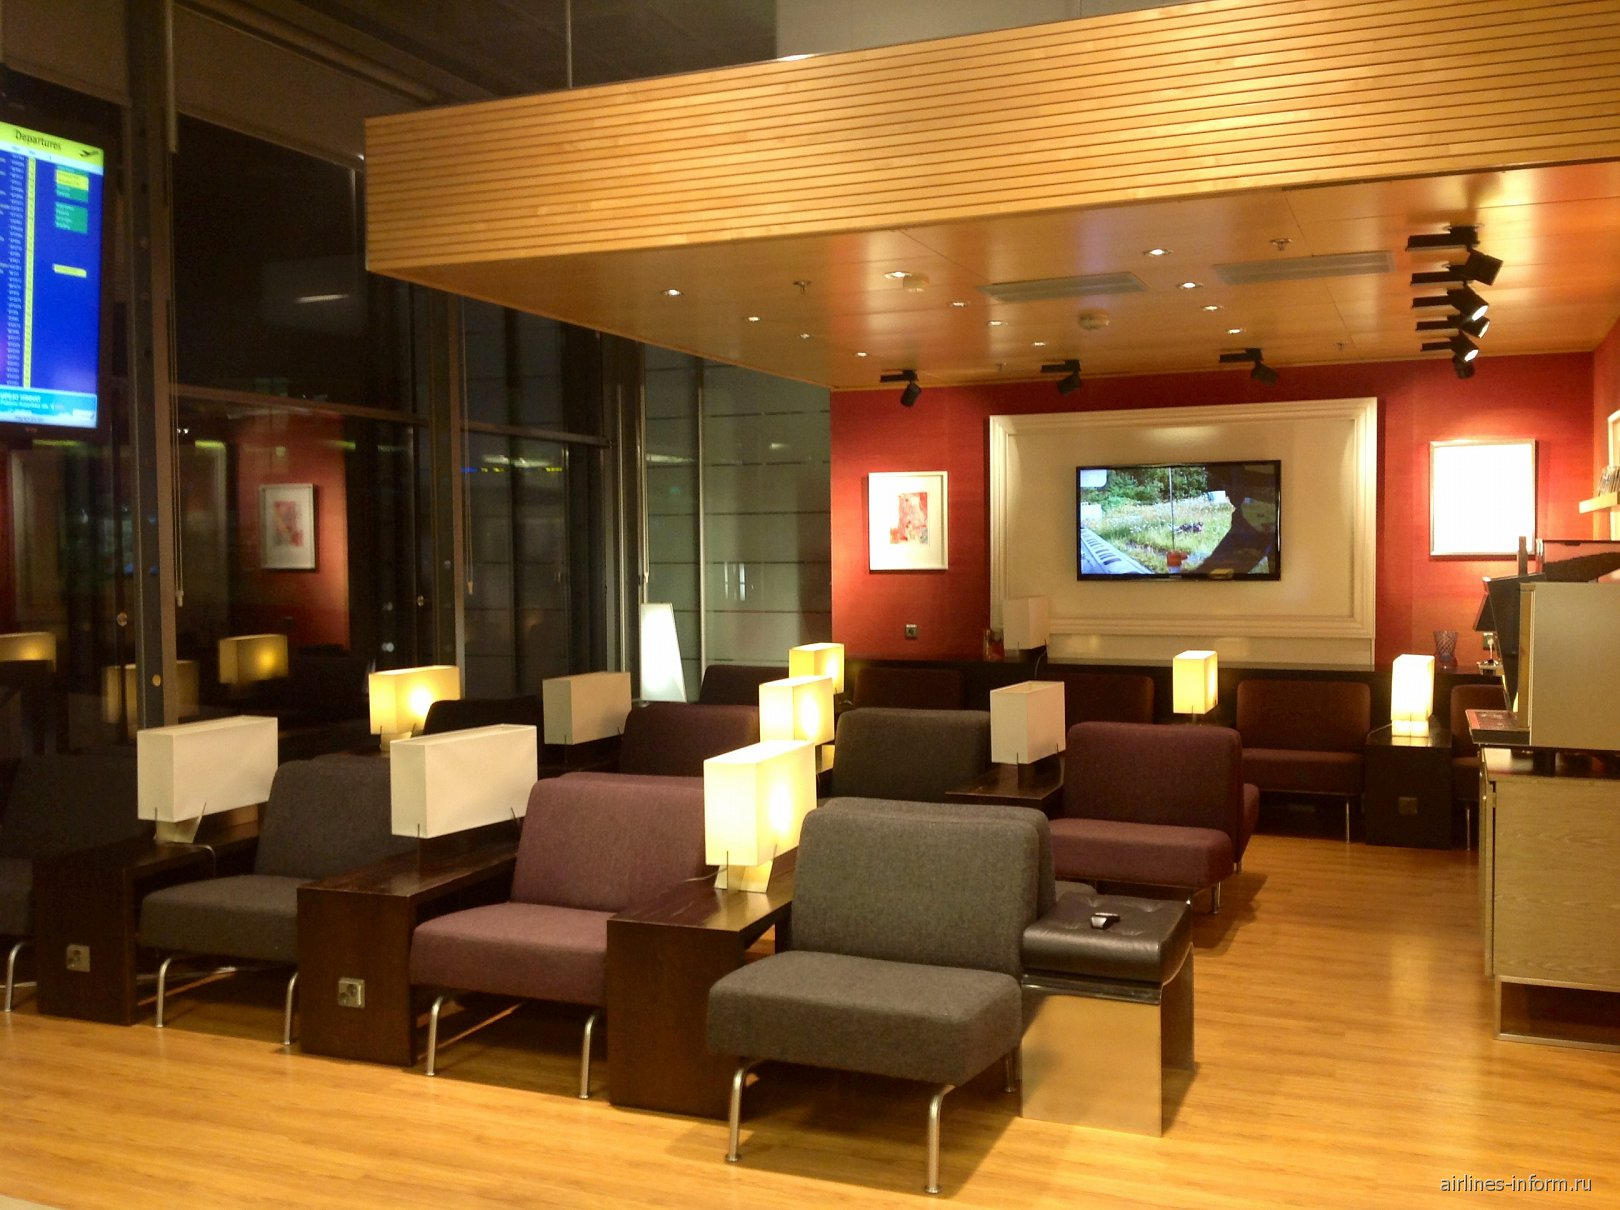 Бизнес-зал в Терминале 2 аэропорта Хельсинки Вантаа